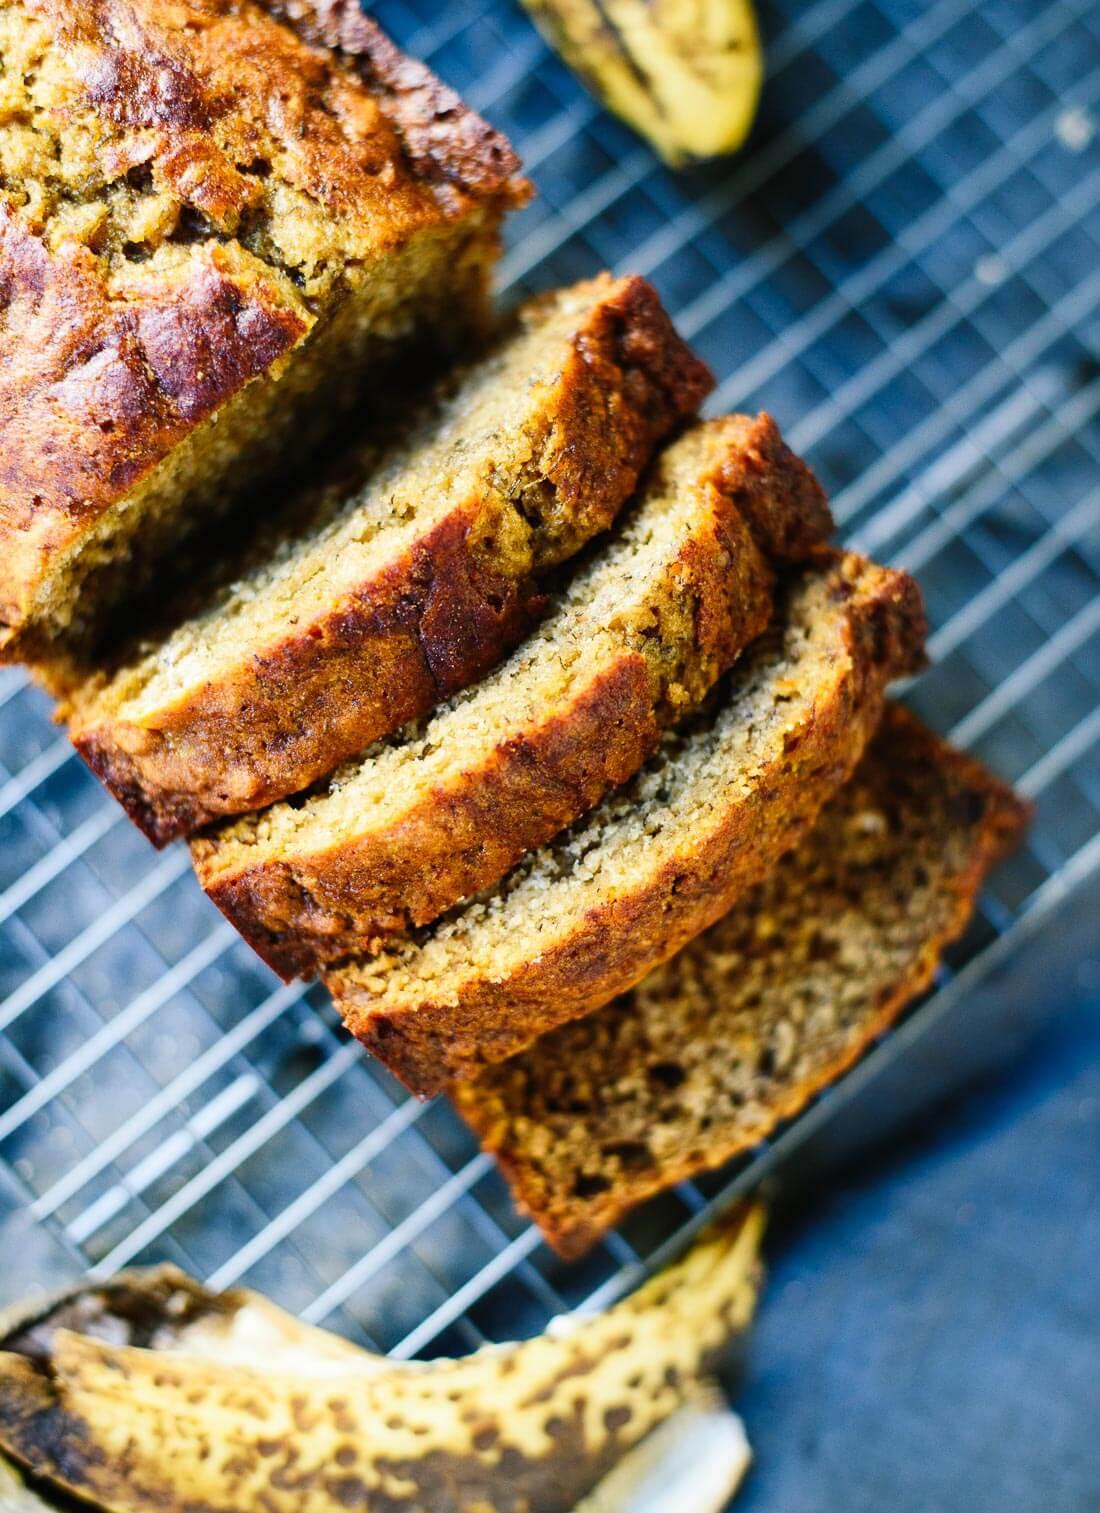 Healthy Banana Bread Recipe With Oats  Healthy Banana Bread Recipe Cookie and Kate